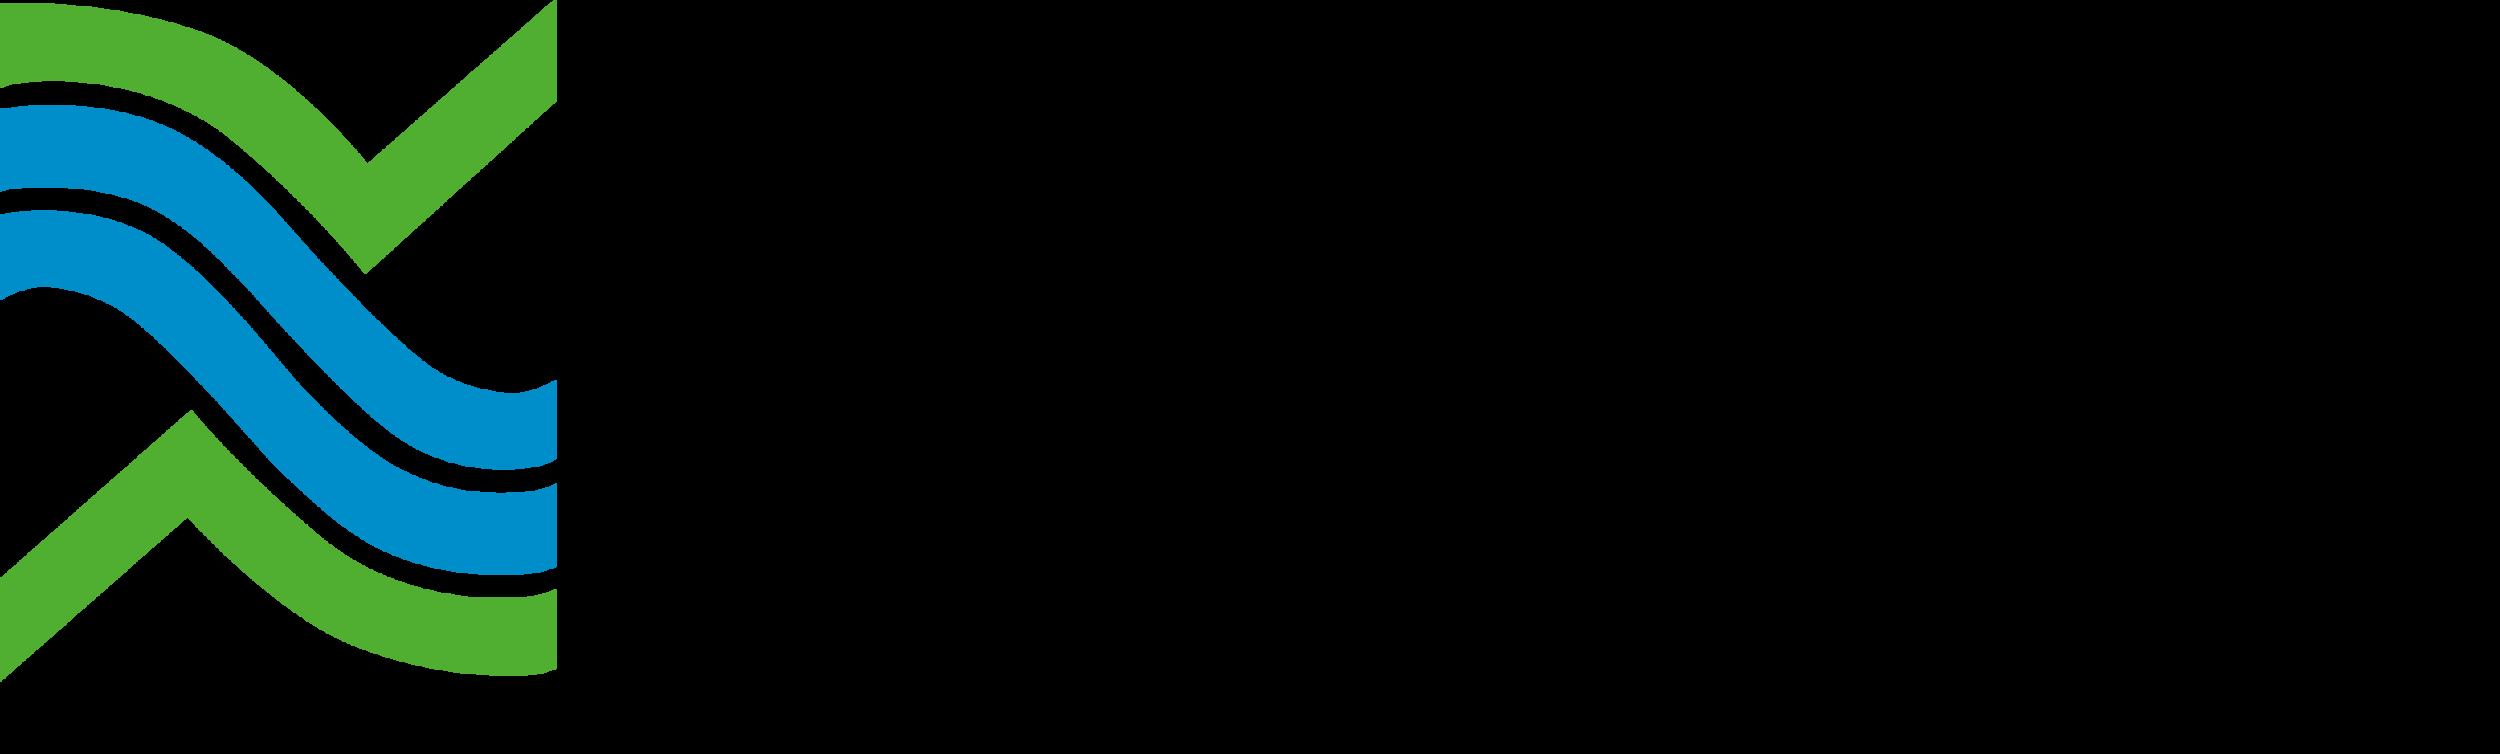 koncernlogotyp_farg.png